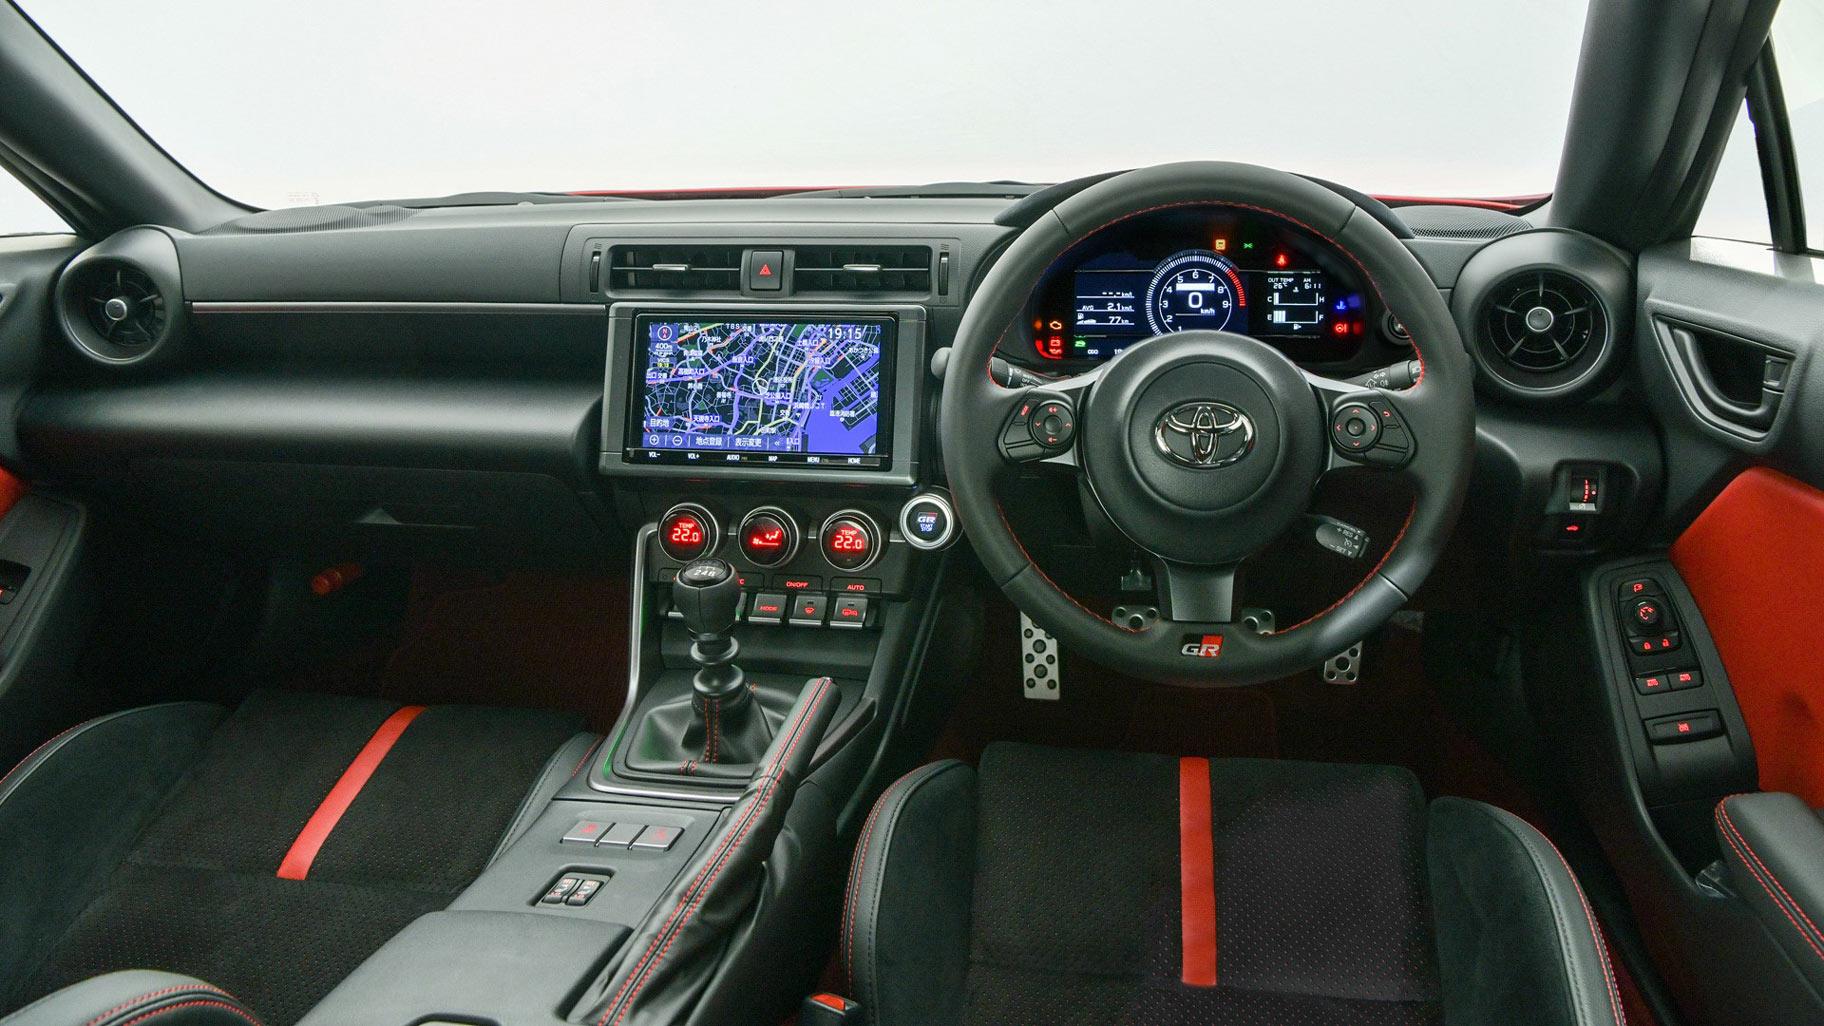 The Toyota 86 Dashboard